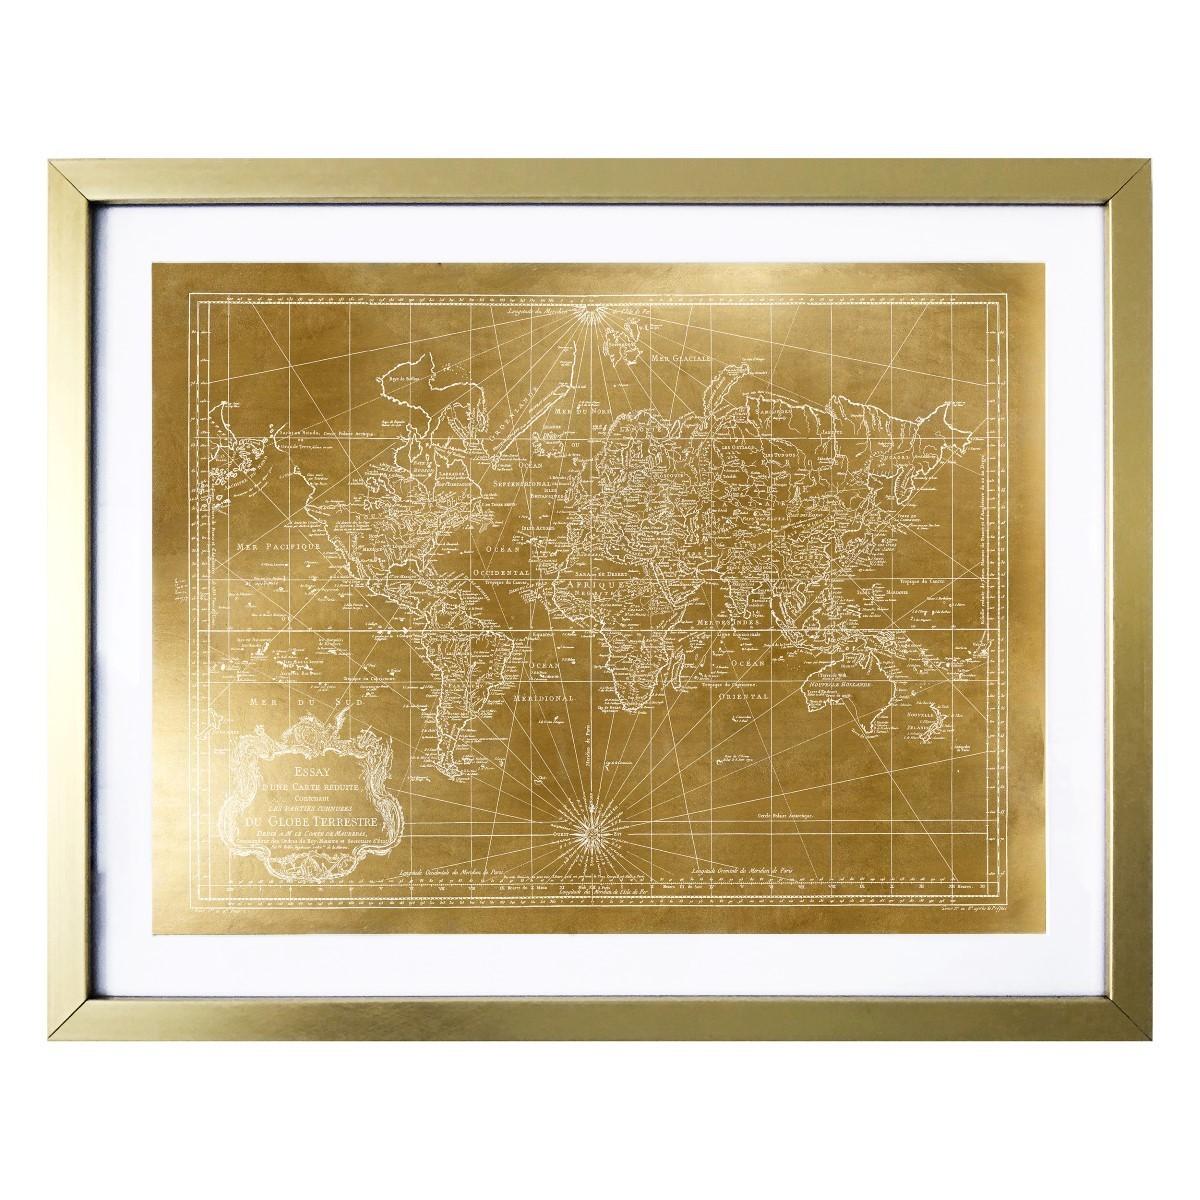 Gold Foil World Map Framed.Shop World Map 1778 Gold Gold Foil Framed Art Multi Free